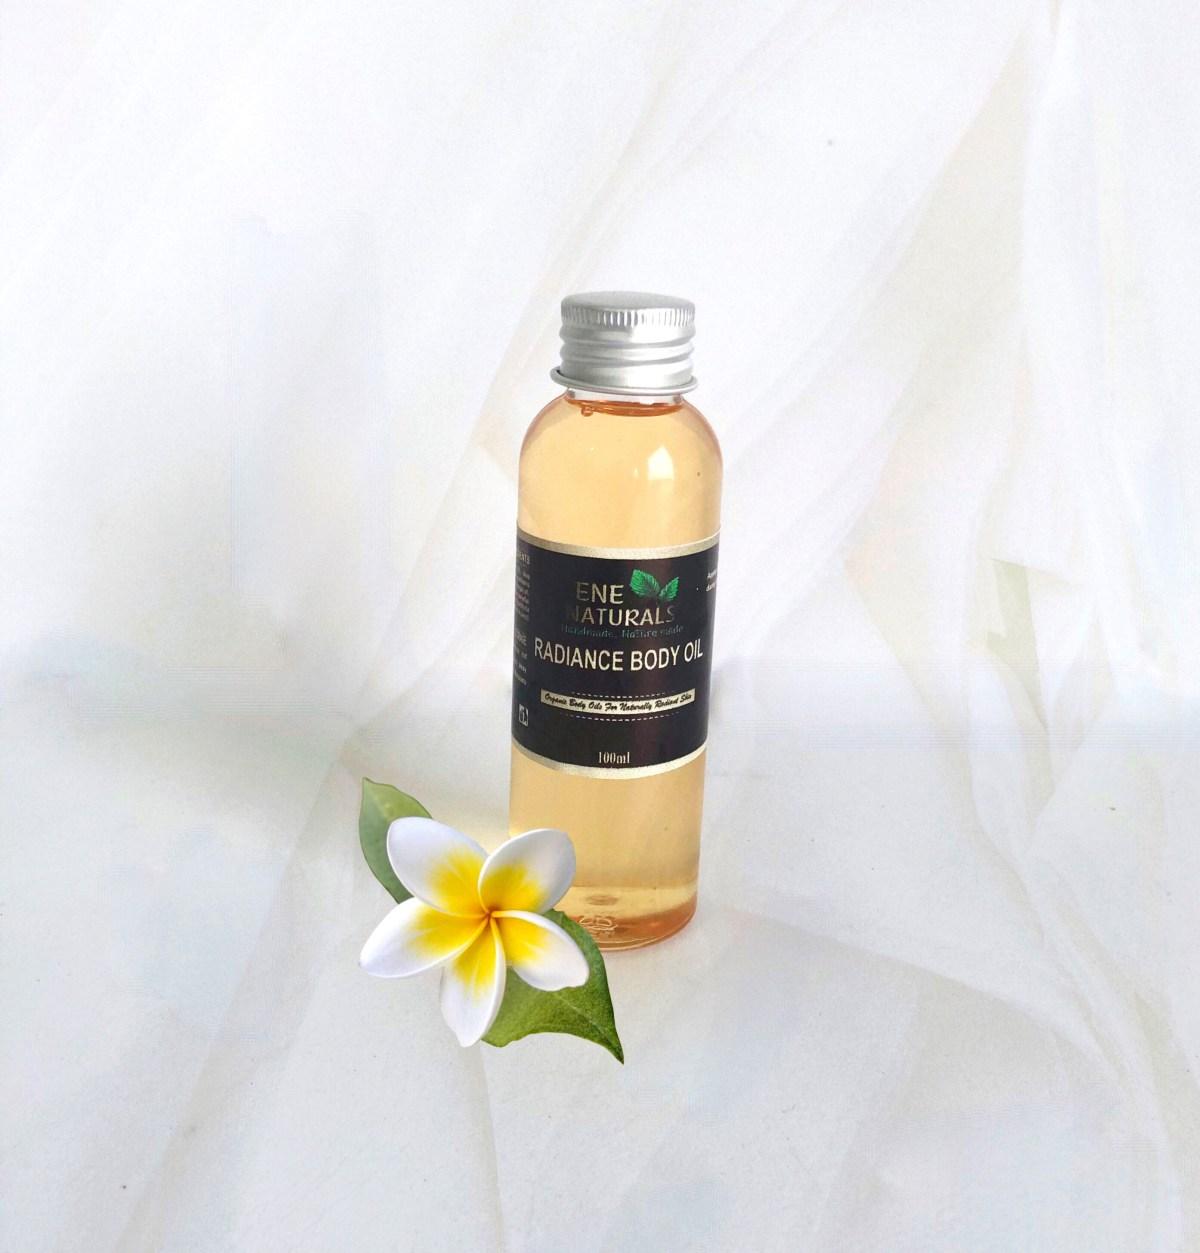 Brightening body oil